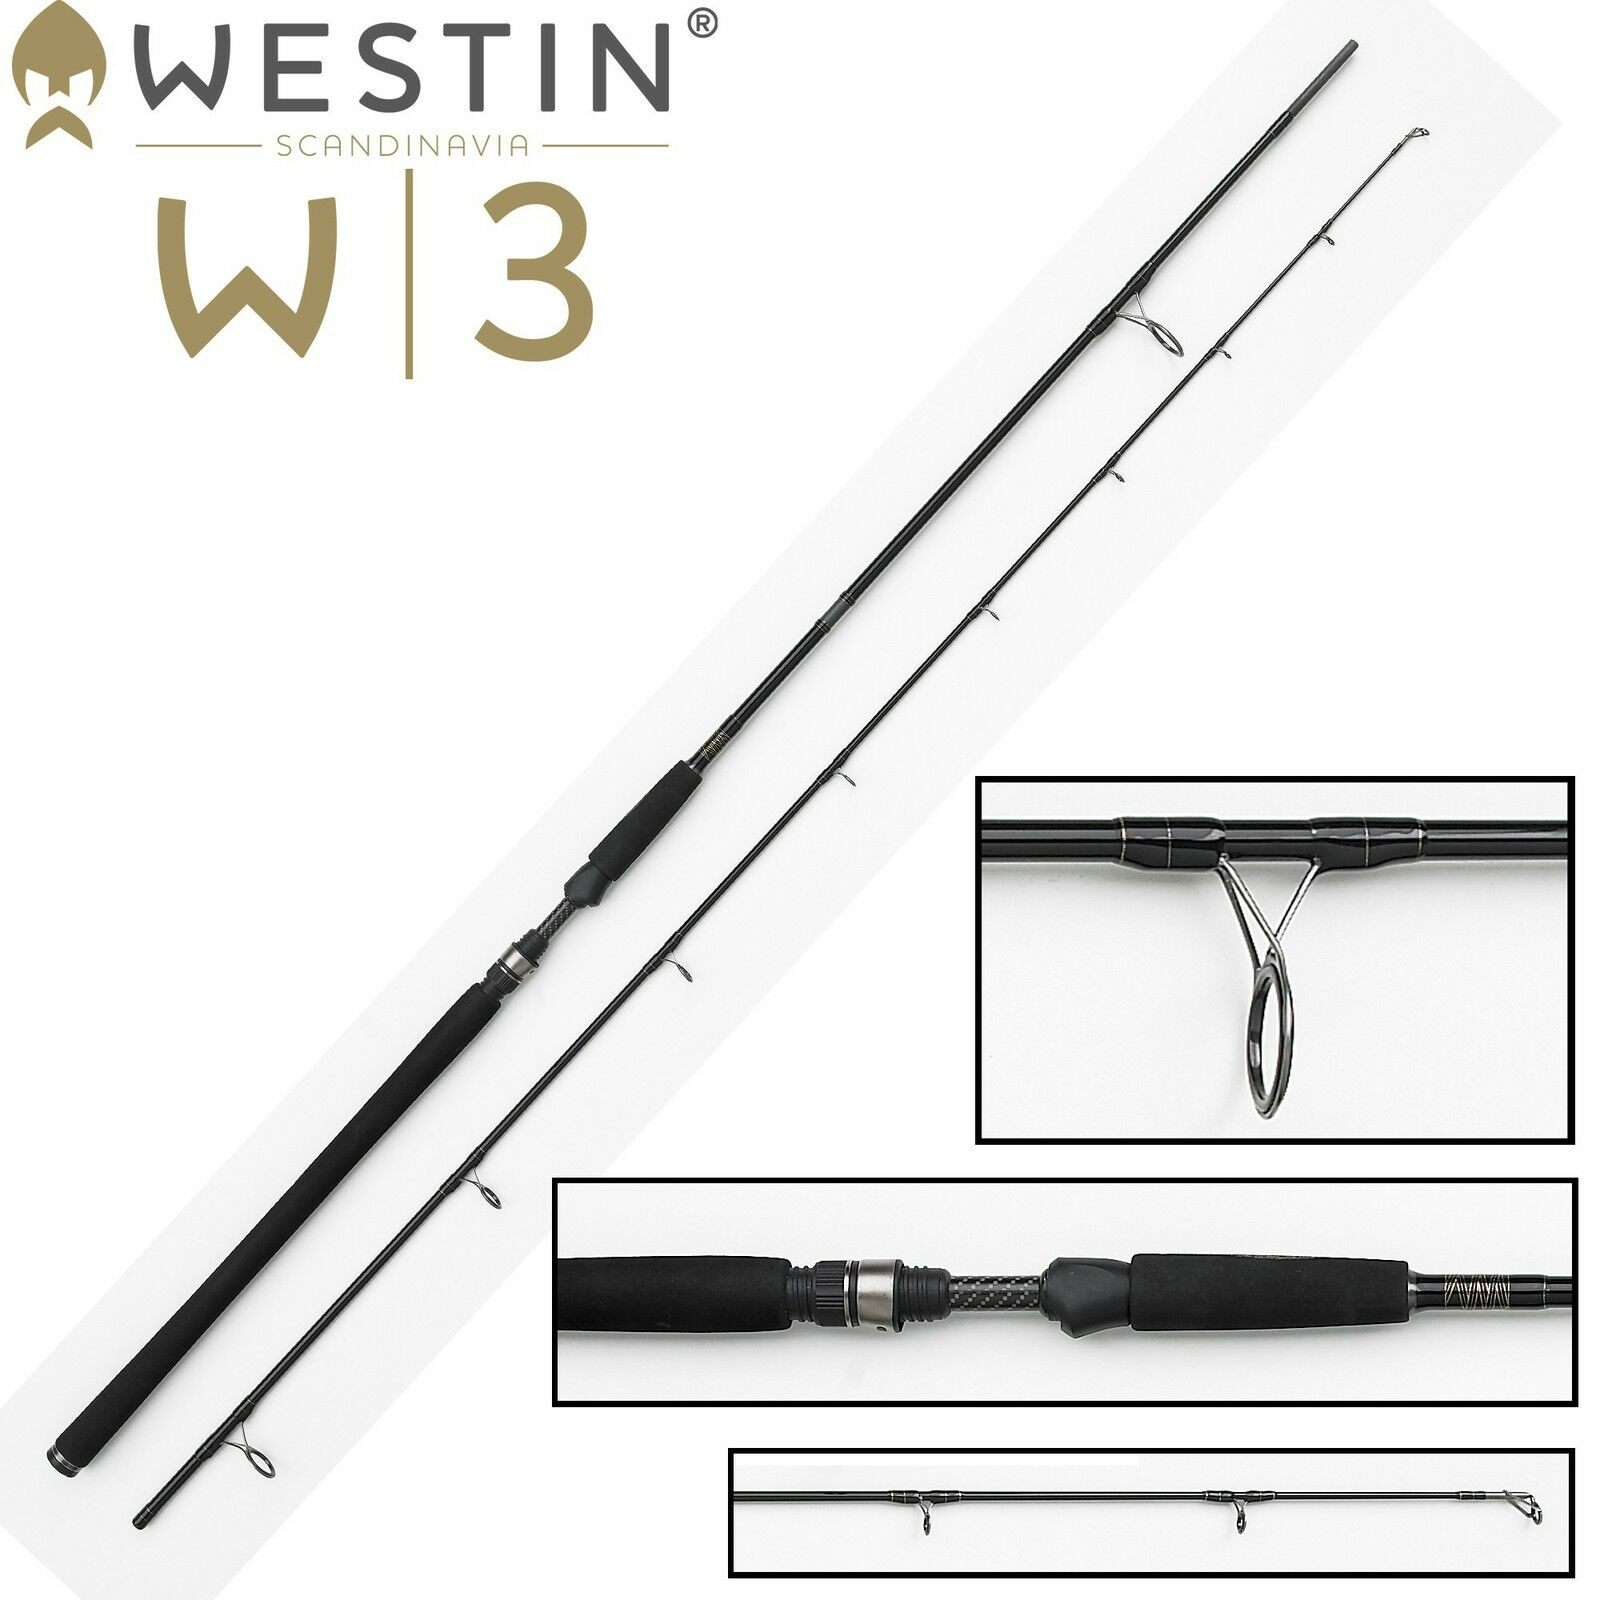 Westin W3 Powercast 278cm XXH 40-130g Spinnrute Blinkerrute für Hecht & Zander